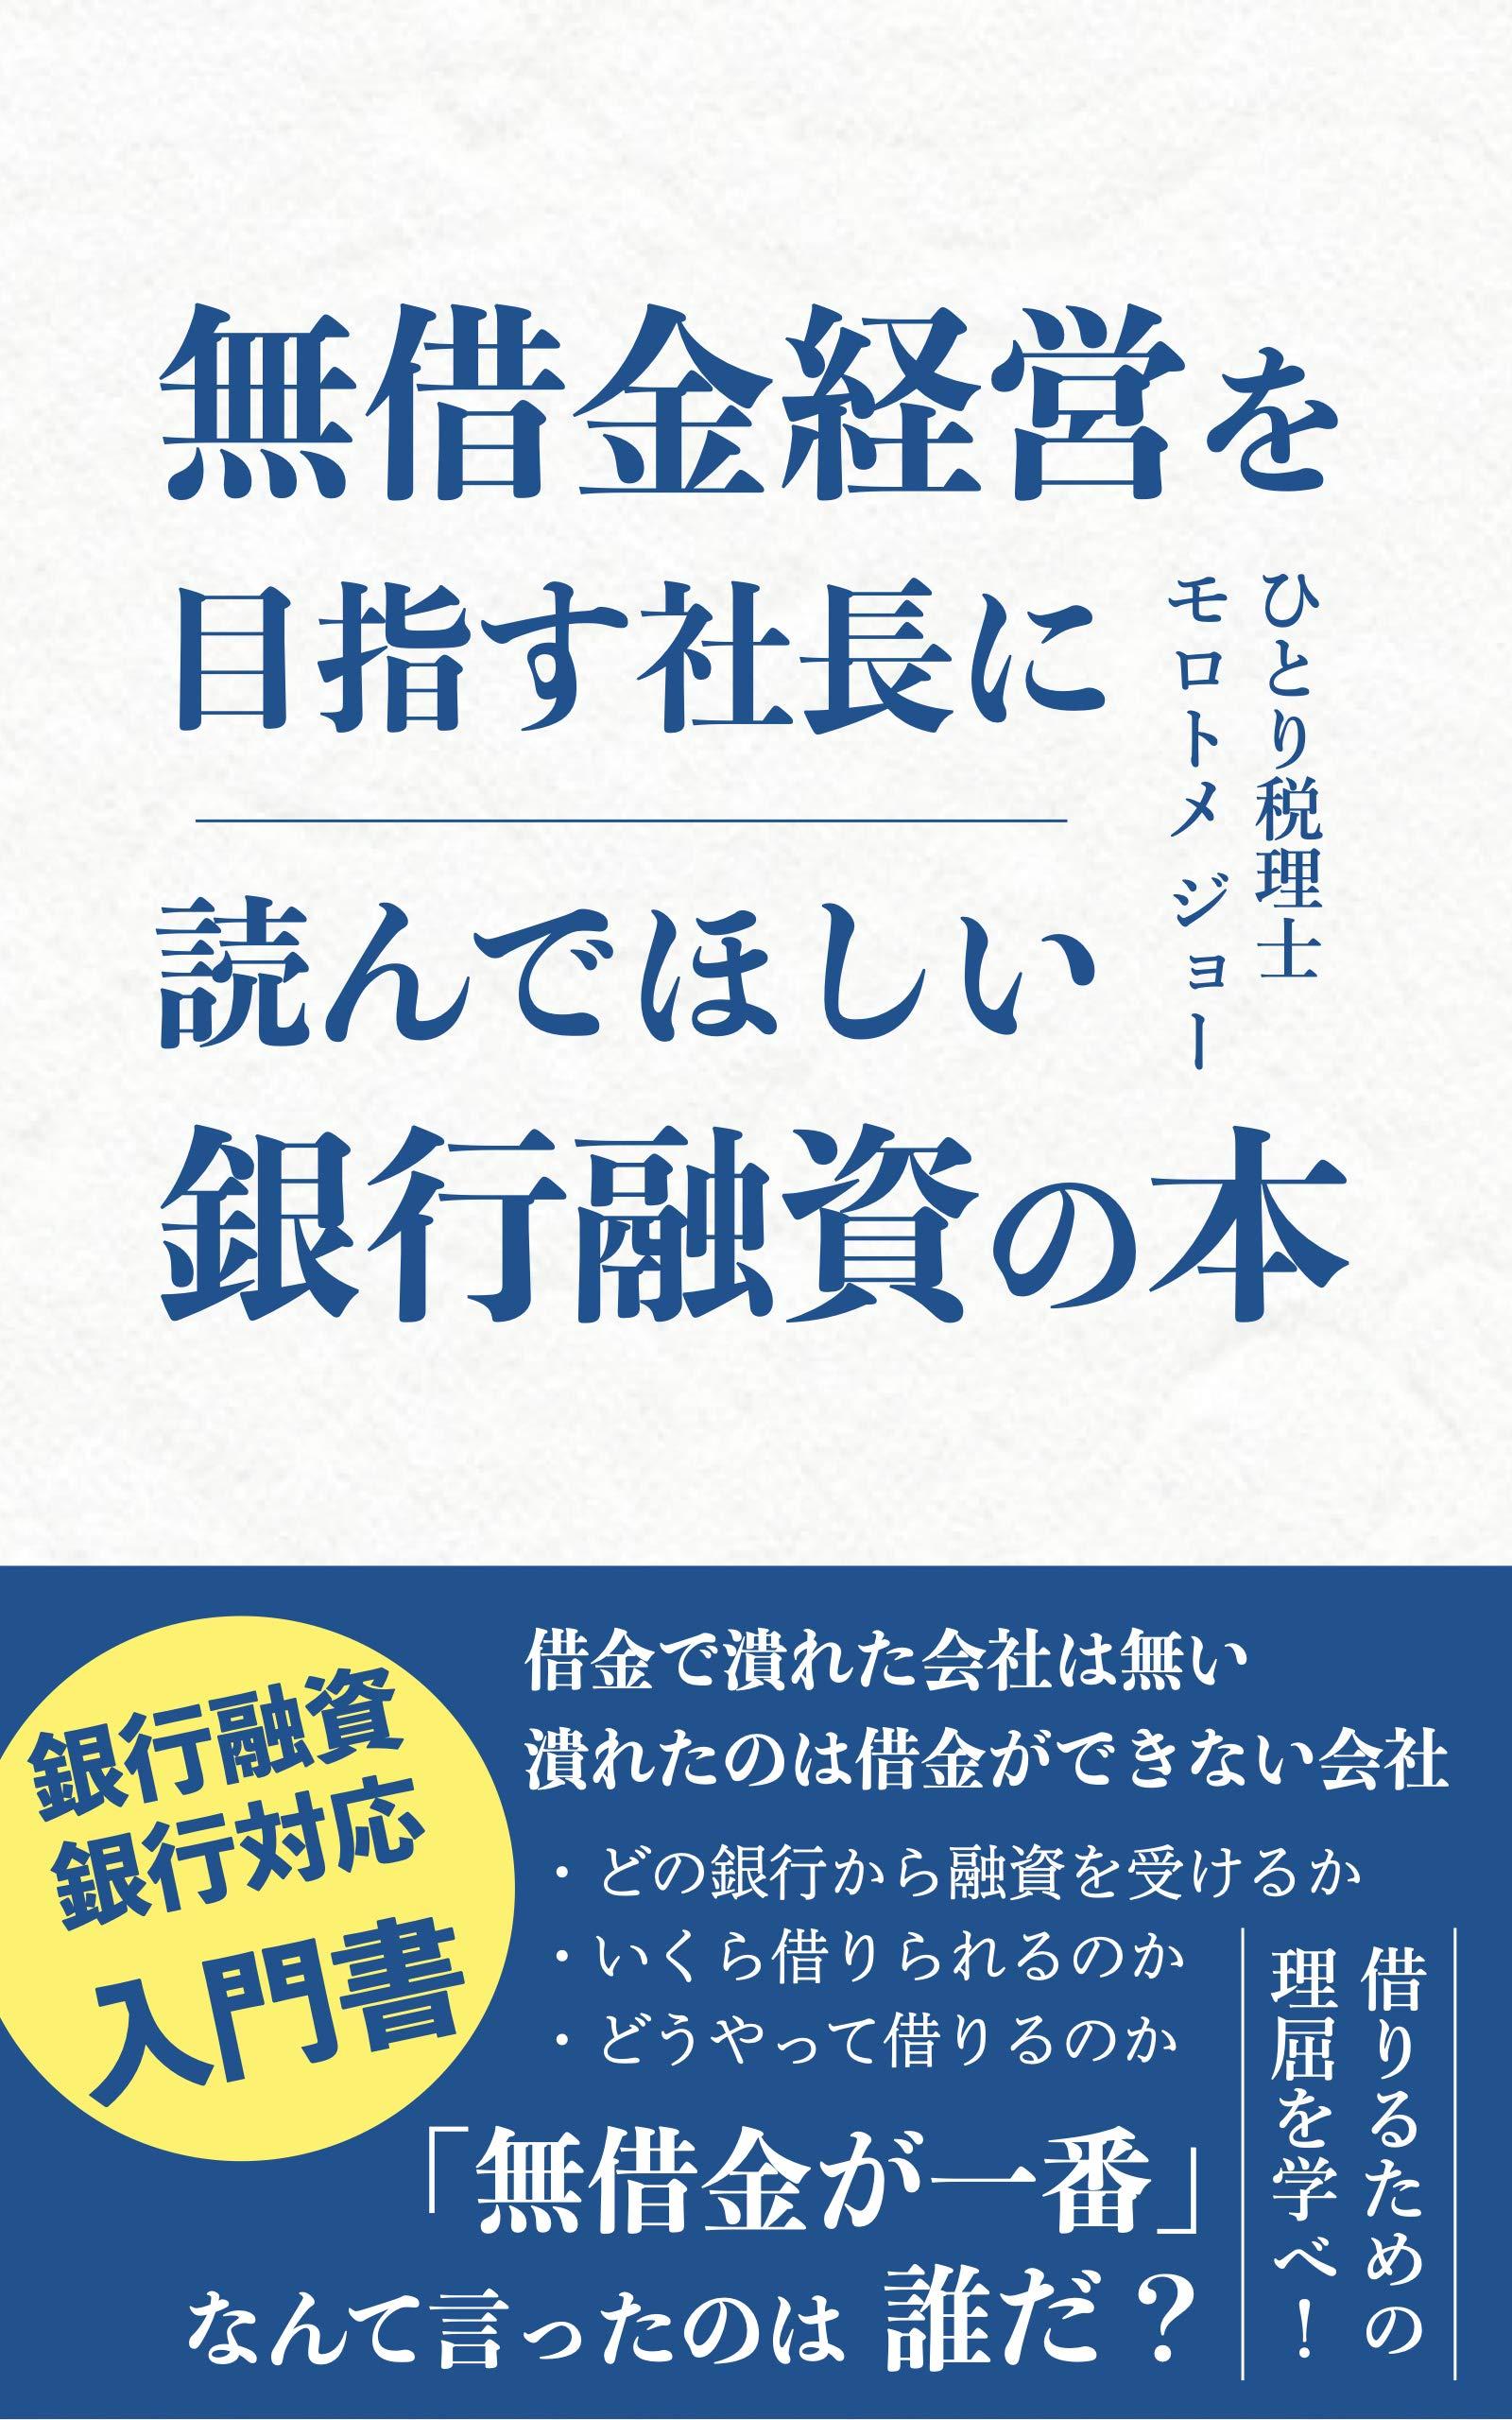 mushakkinkeieiwo mezasushachouni yondehosii ginkouyuushinohon (Japanese Edition)